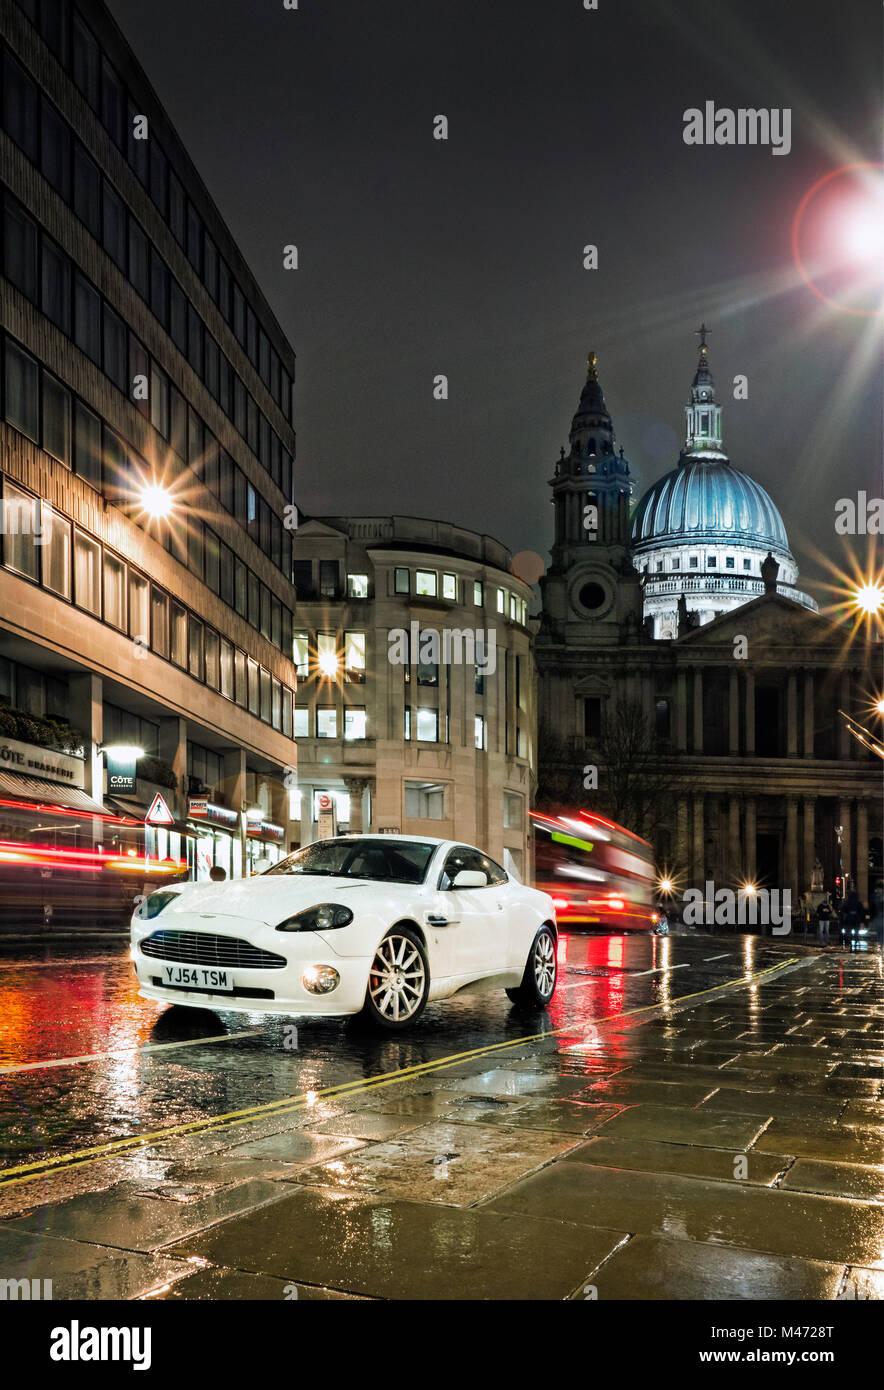 2004 Aston Martin Vanquish in the City of London UK - Stock Image